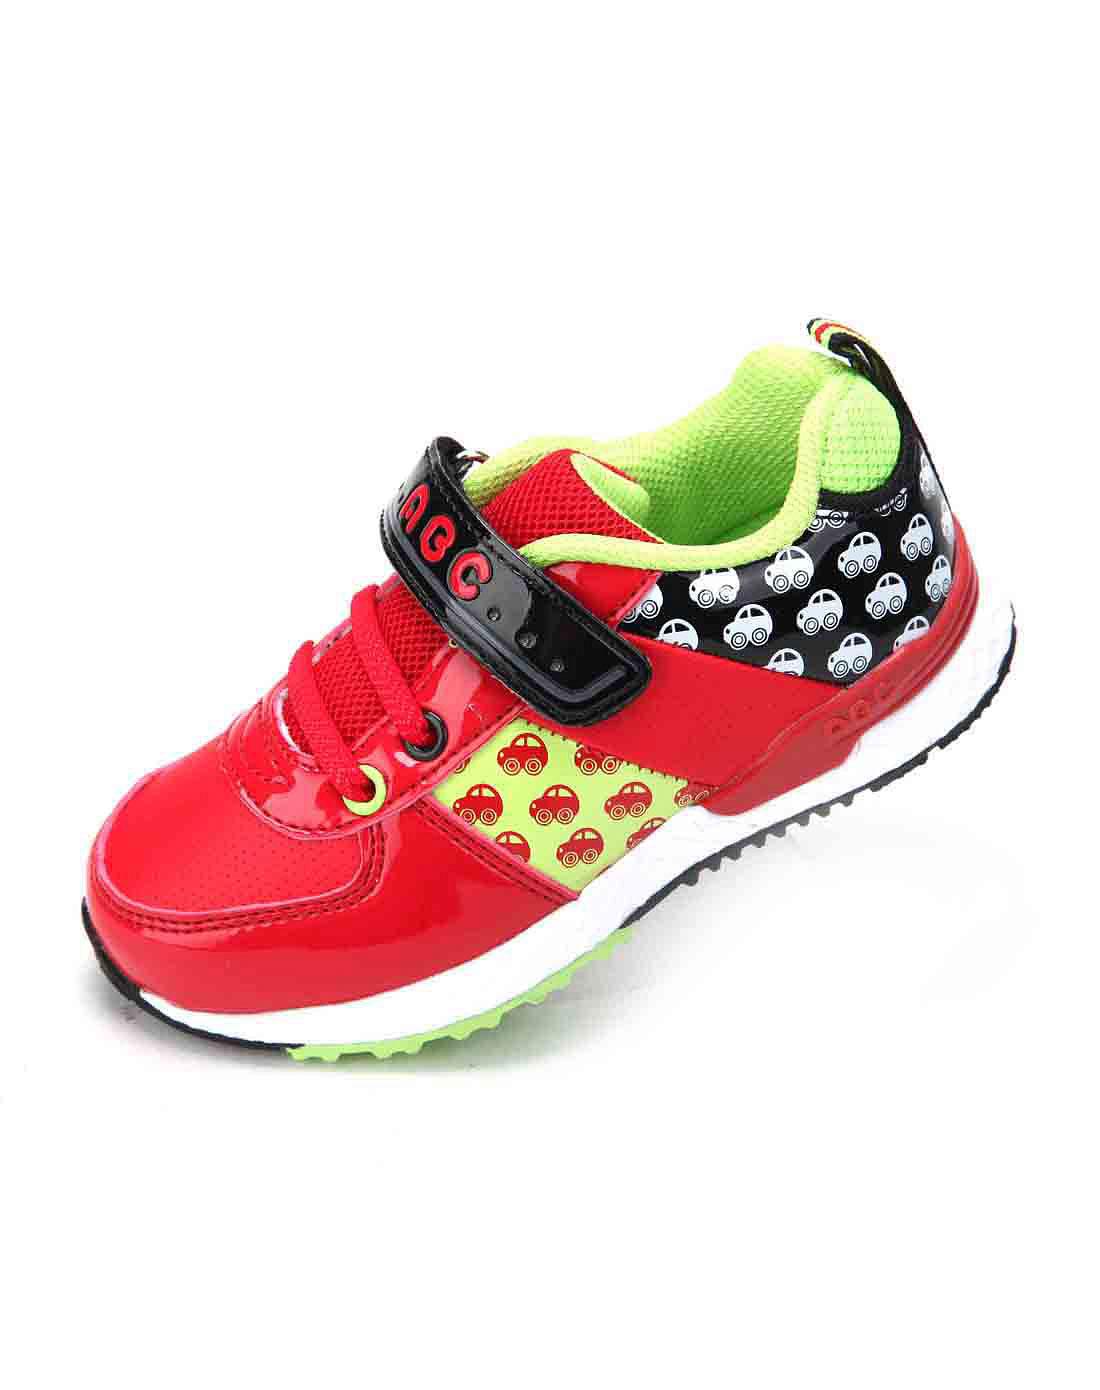 abckids男女童鞋男款小童红黑运动鞋y2322328d-6003